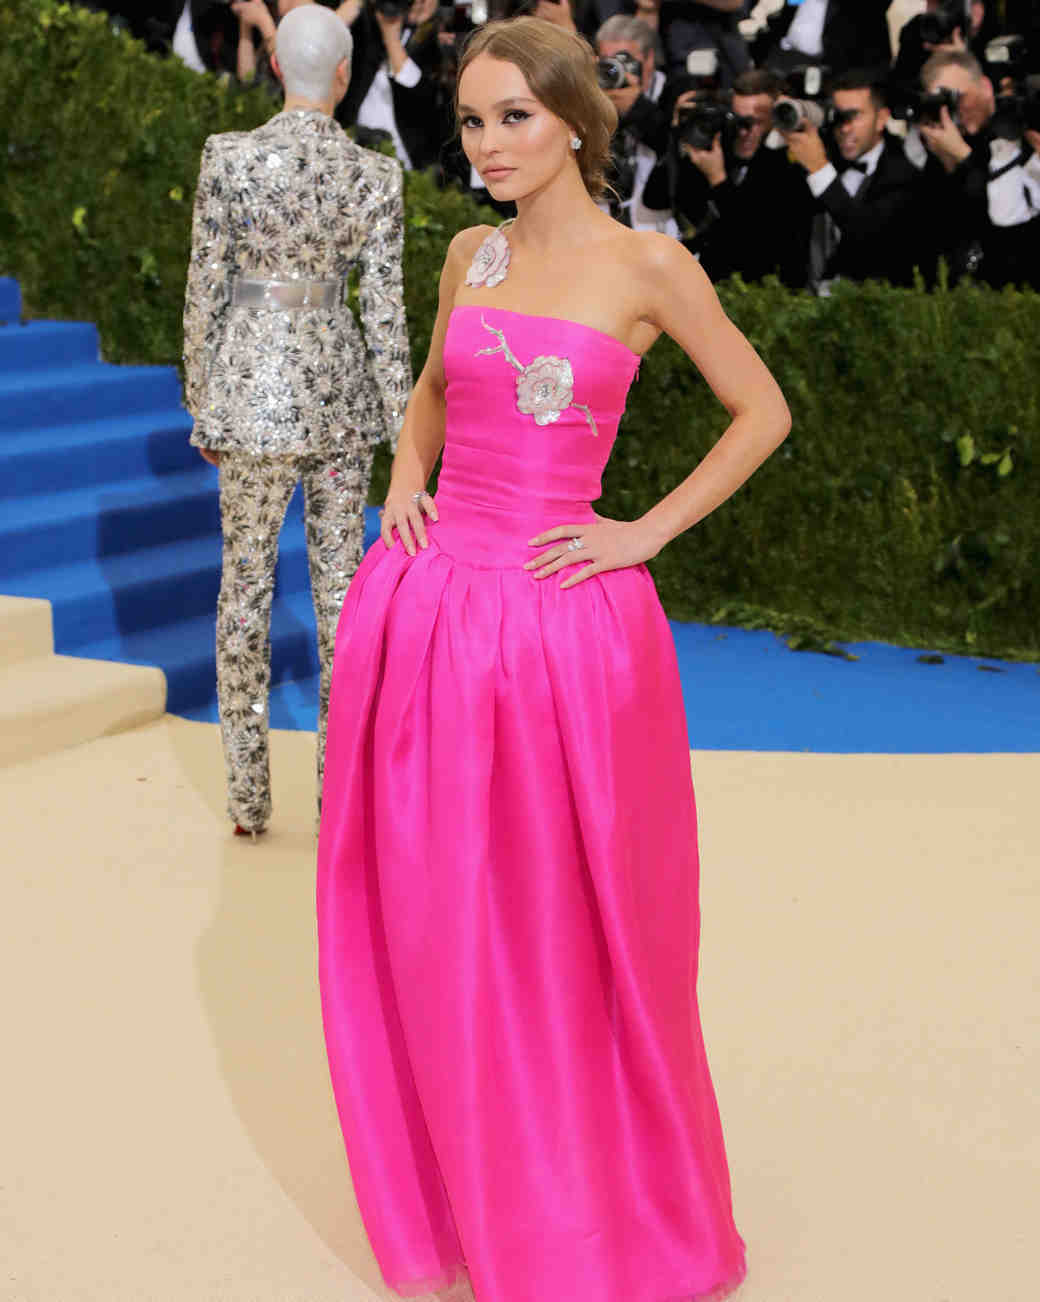 Lily-Rose Depp Met Gala Dress 2017